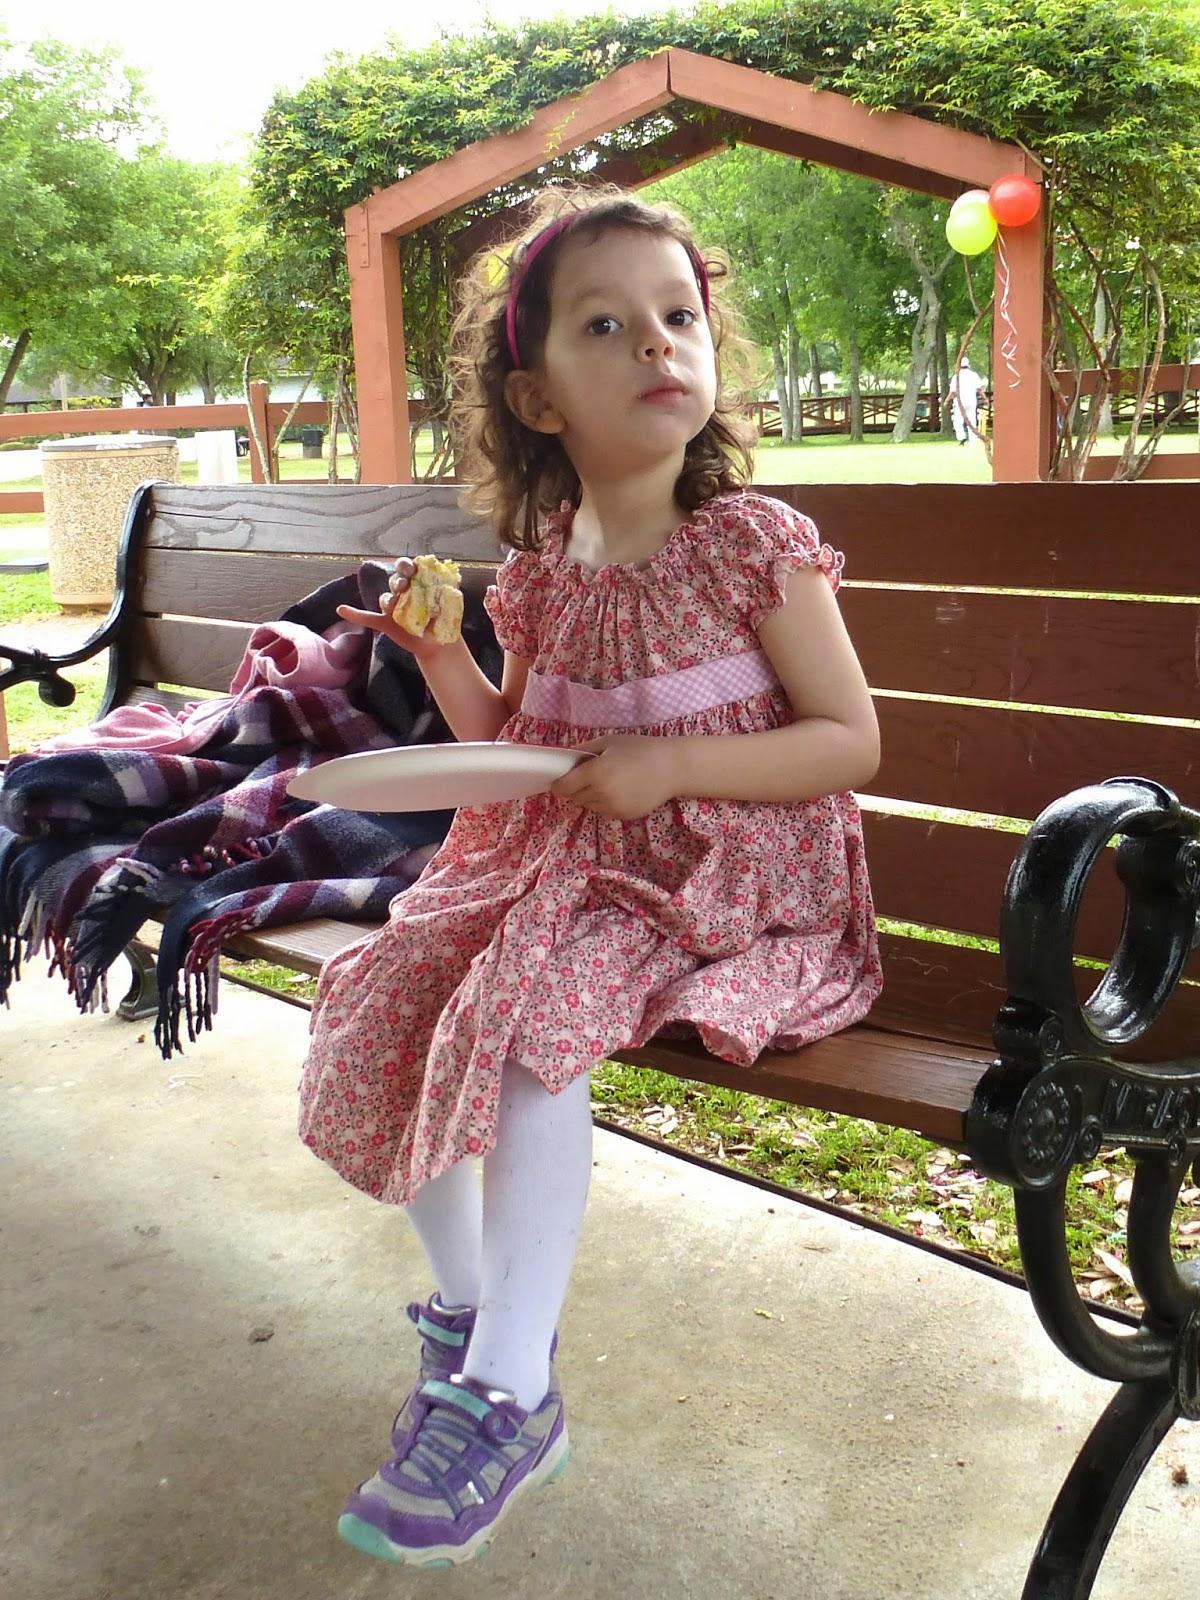 Birthday Girl in Cowgirl Dress